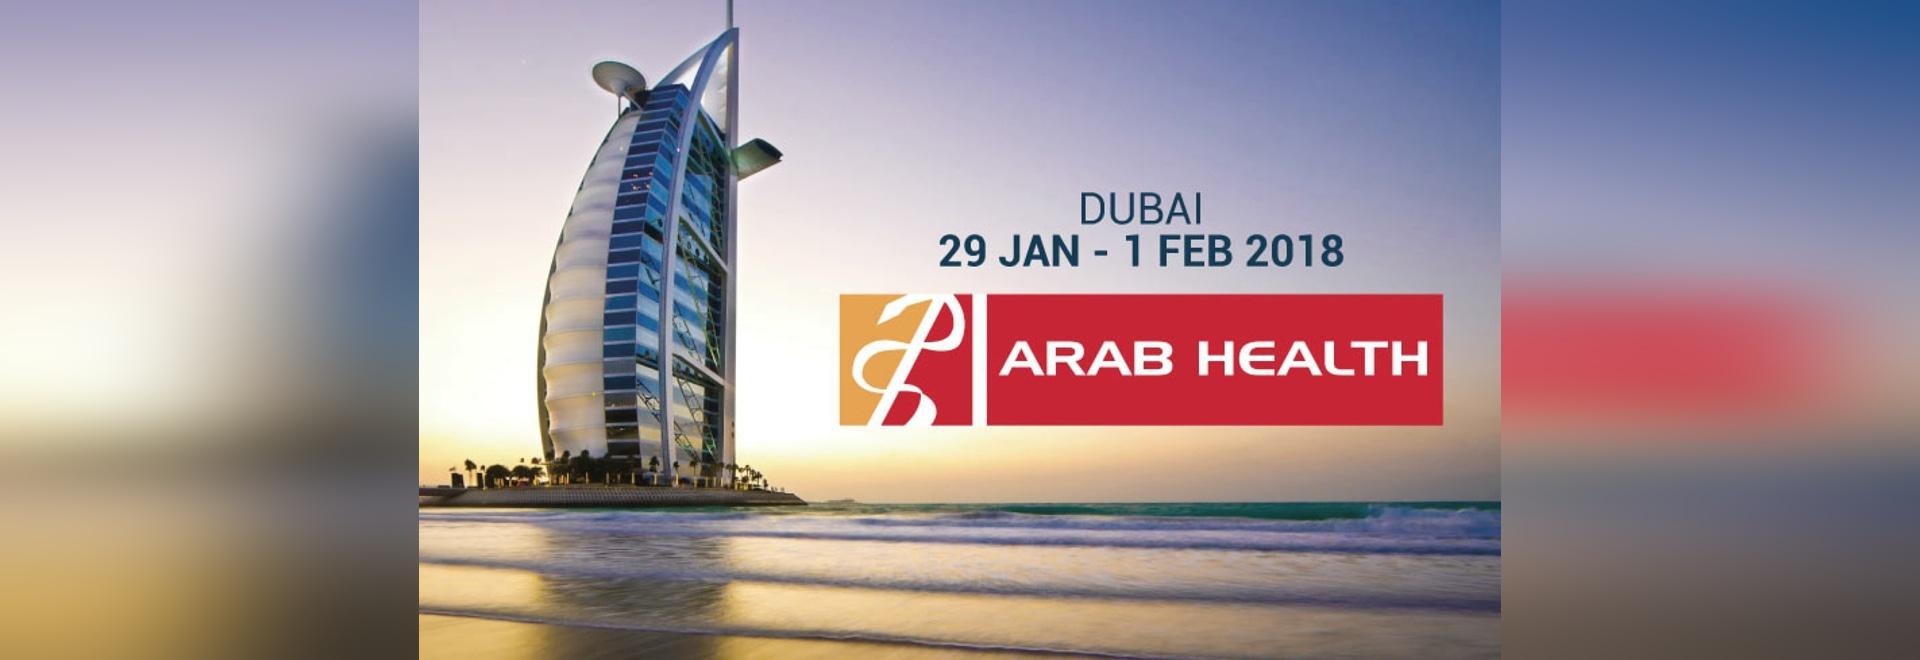 Echolight at Arab Health 2018 in Dubai.